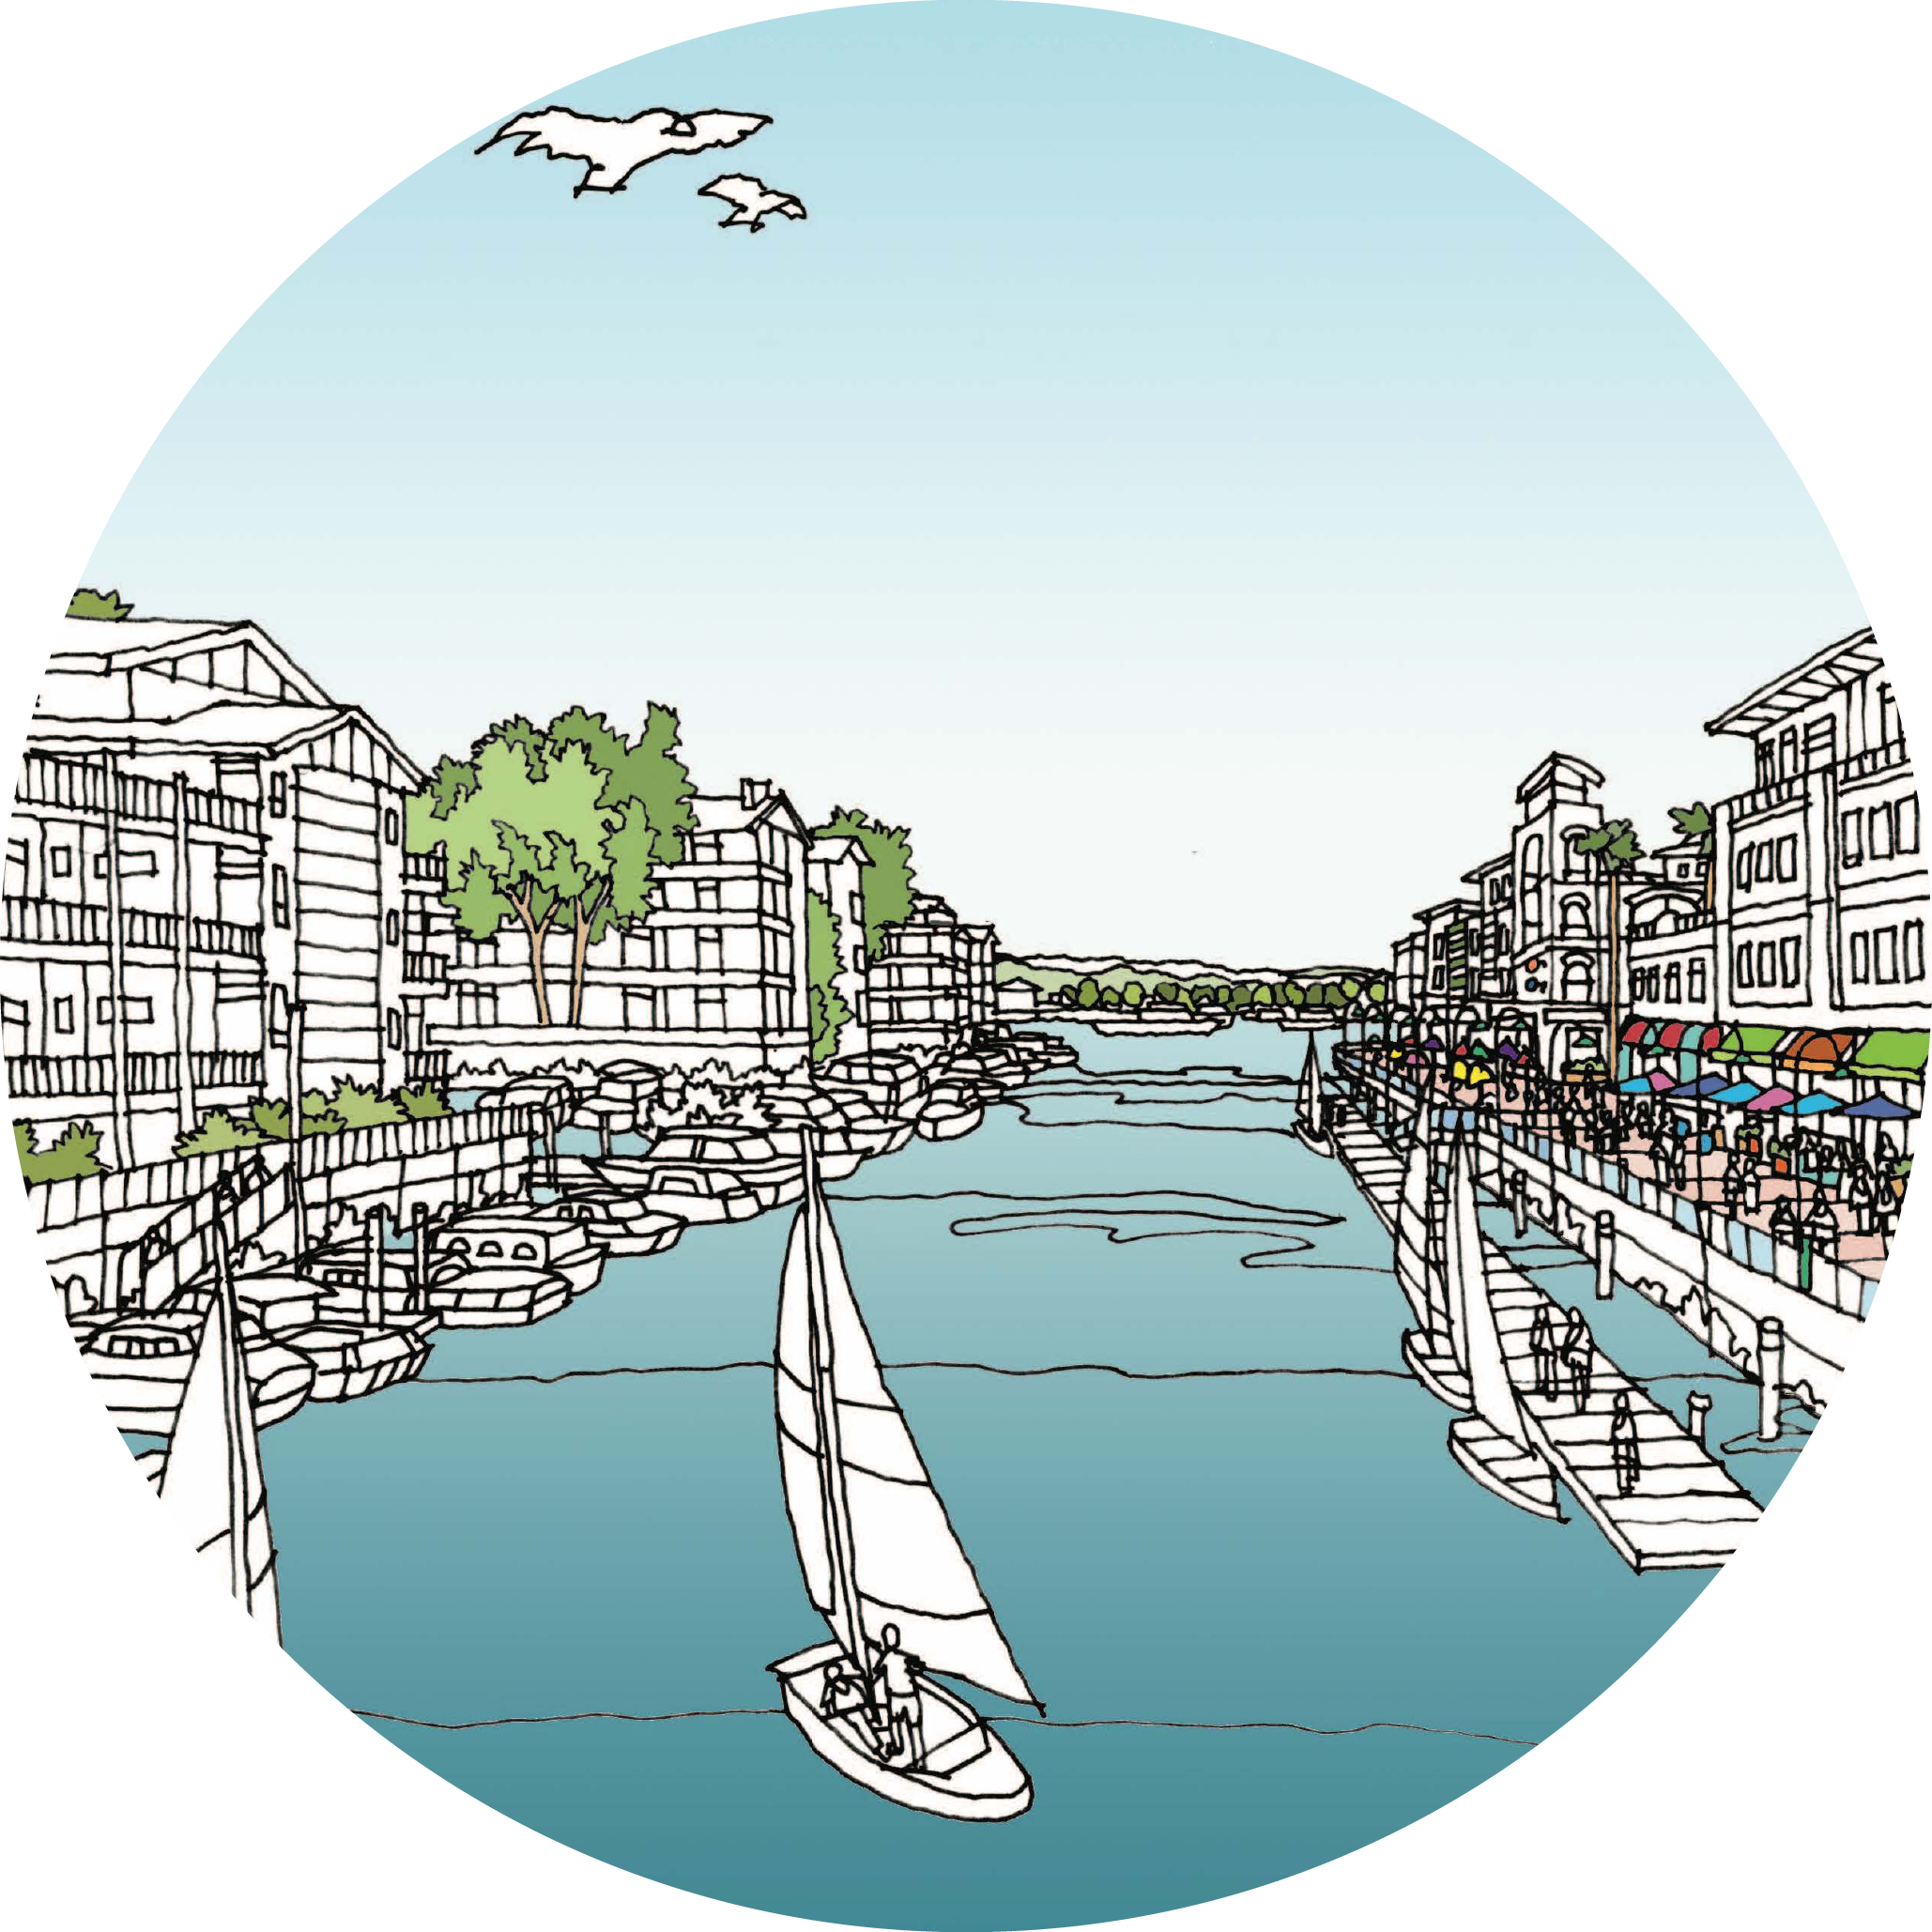 City of Long Beach Plans